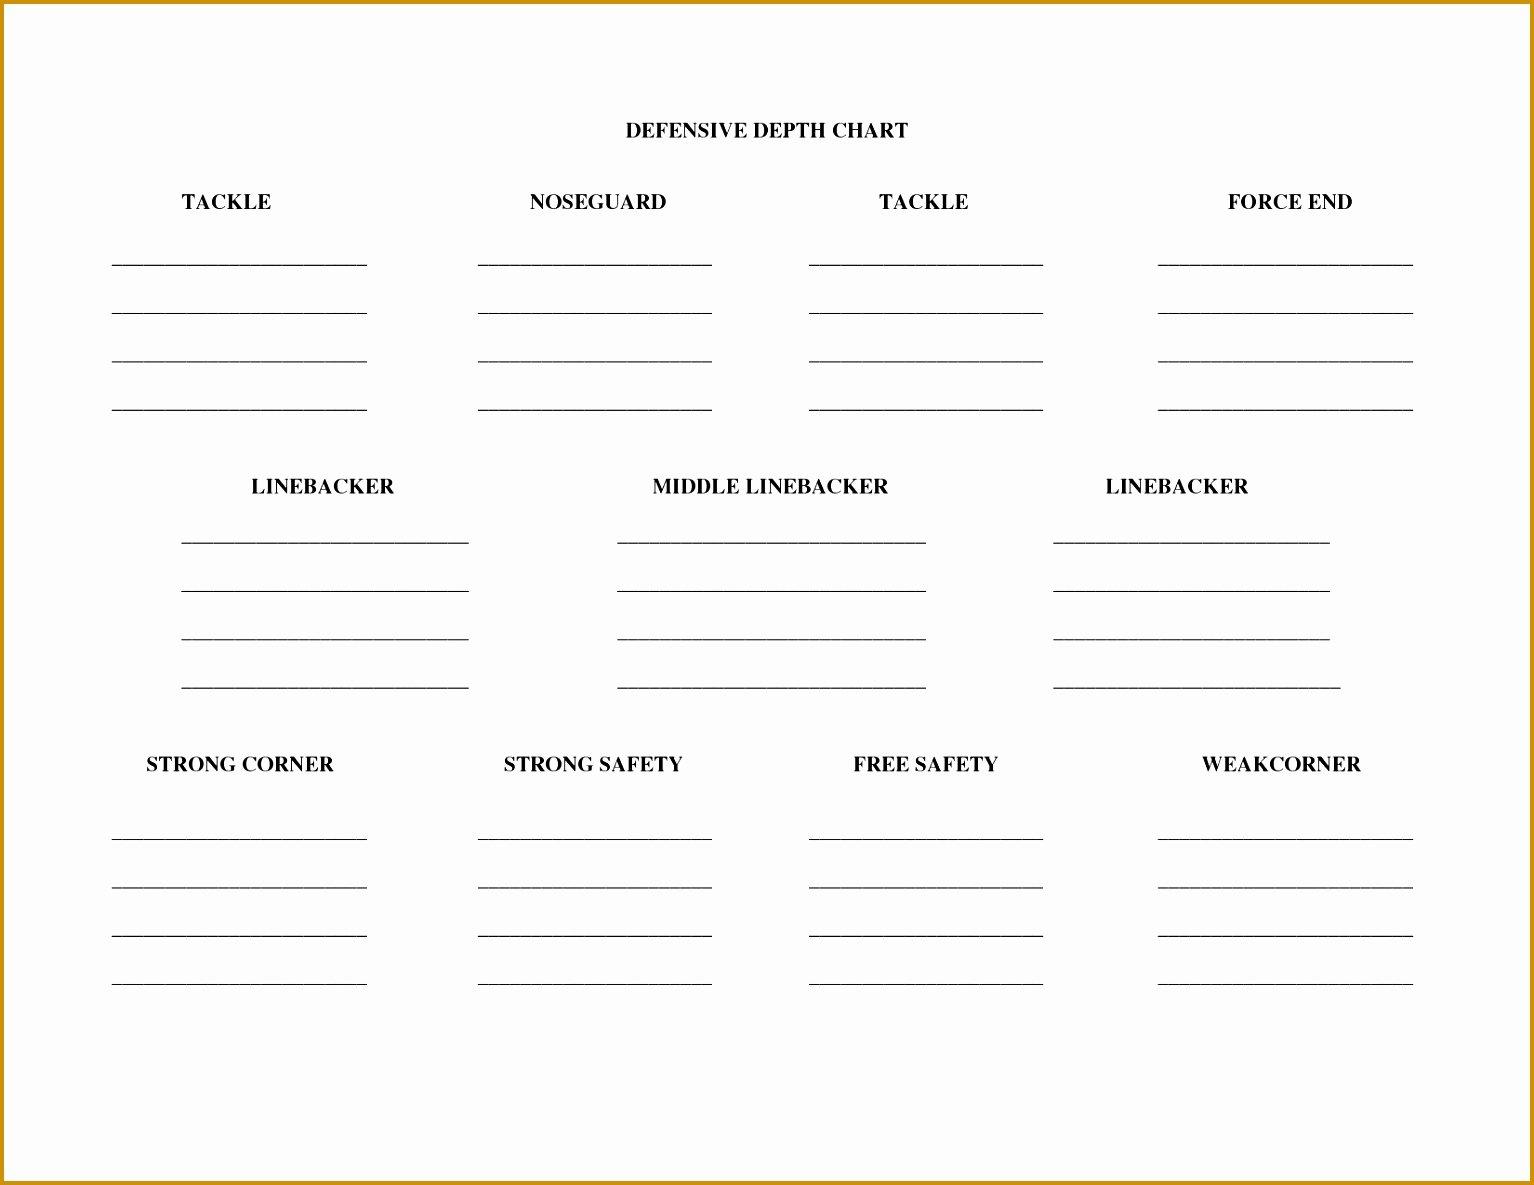 Football Depth Chart Template Excel format Inspirational 3 Fensive Depth Chart Template Football